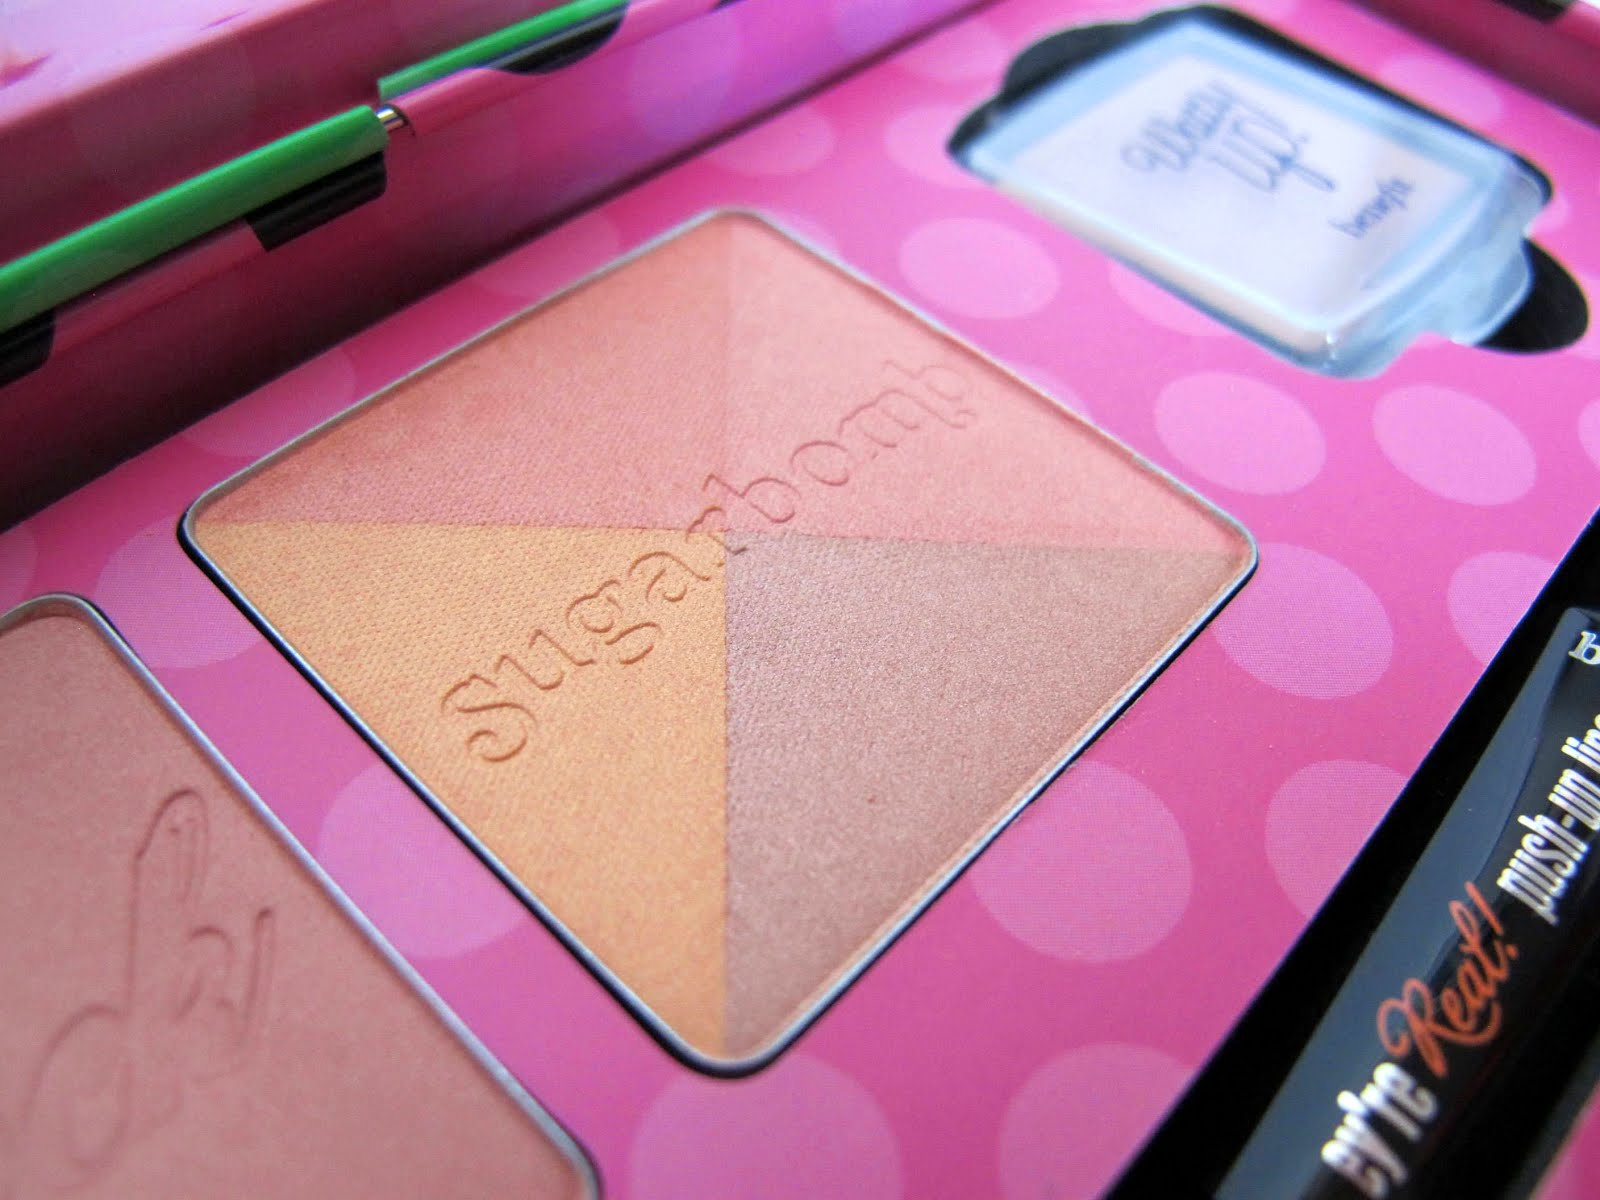 Blush Benefit